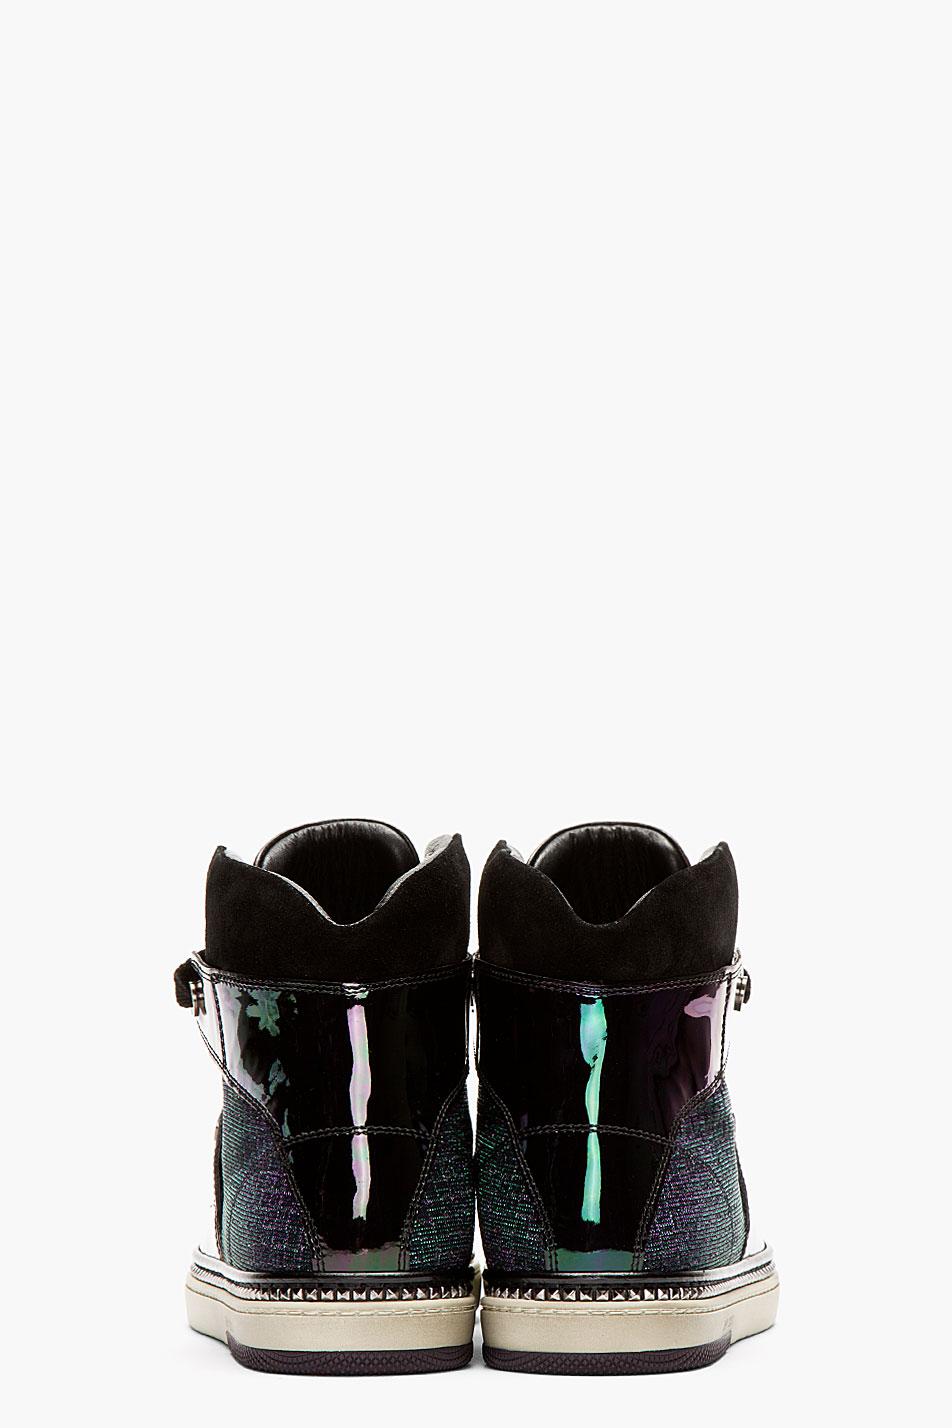 Jimmy Choo Black Iridescent Petrol High-Top Sneakers 3